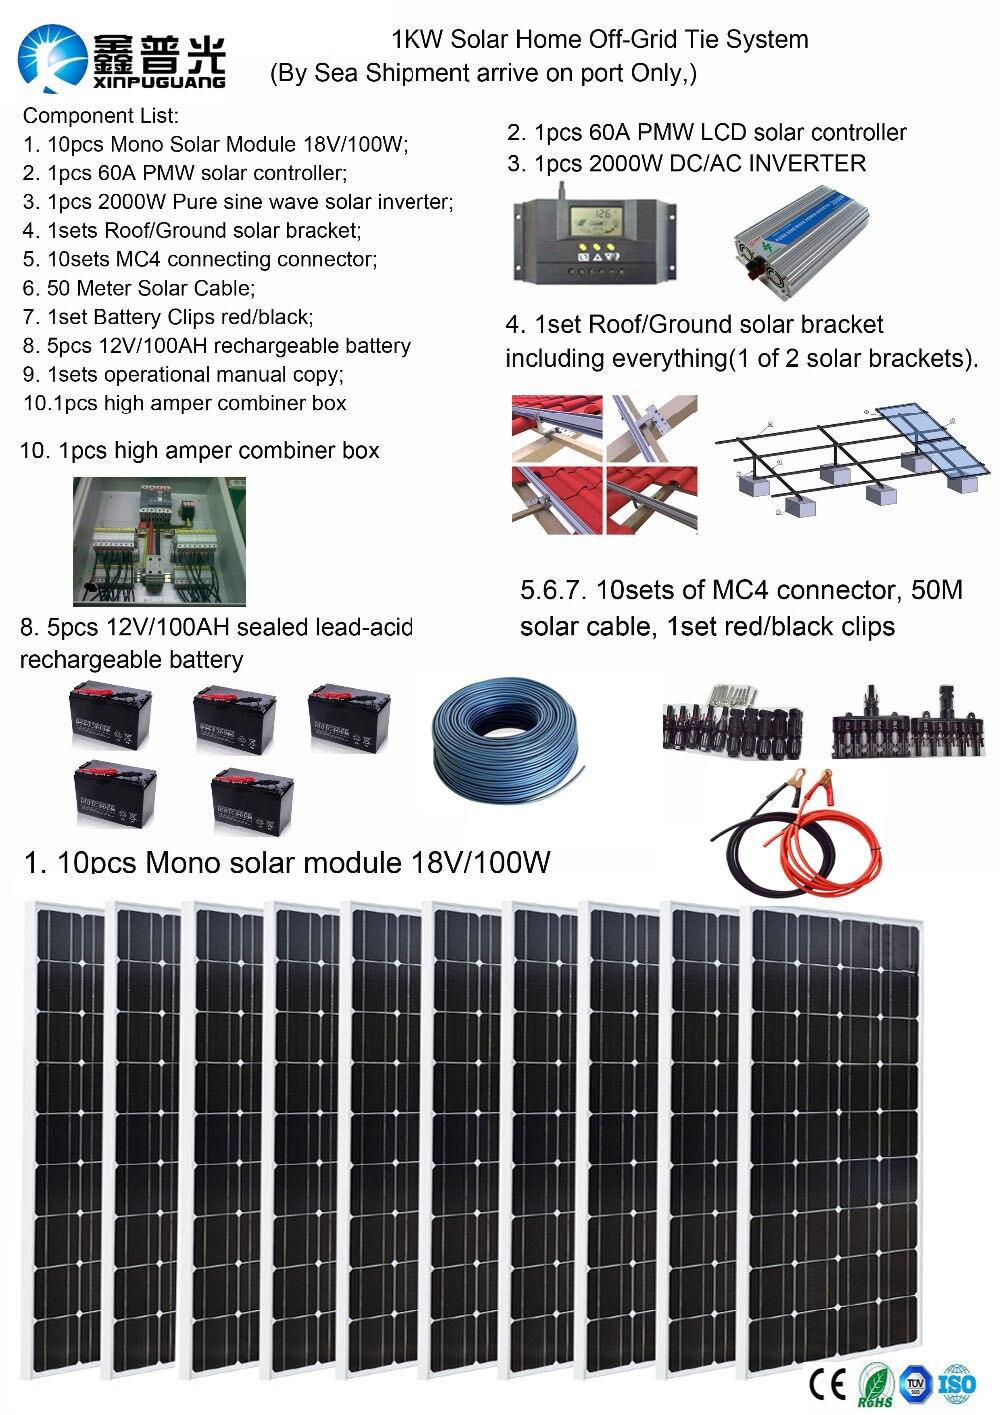 Solar panel system 12V 110V 220V 1000W Solar Home off-grid tie systems sea shipment 10pcs 100W solar modules bracket battery